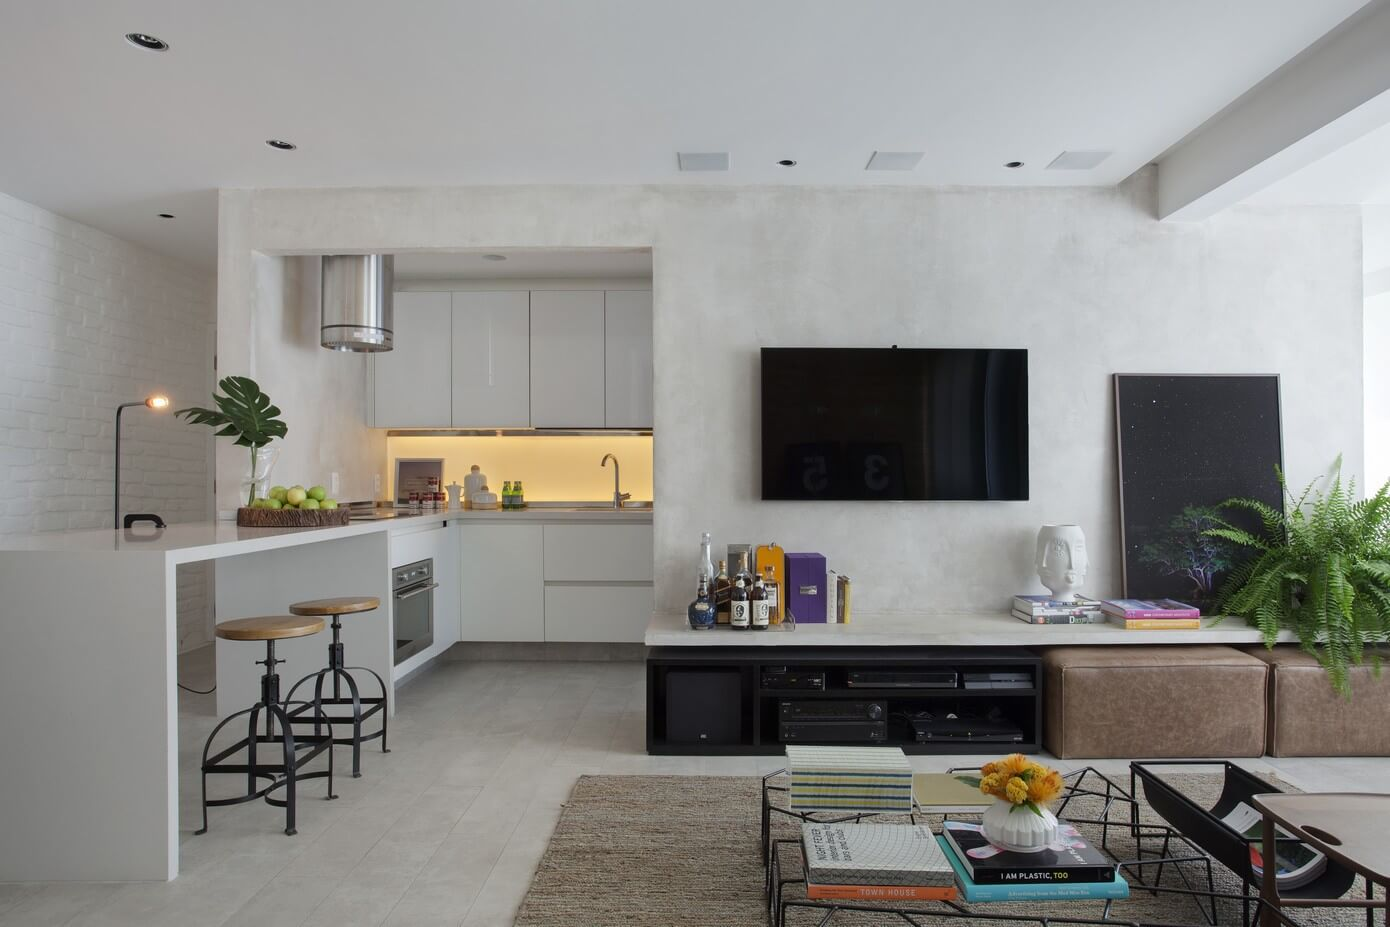 светъл и изчистен двустаен апартамент_roca_3